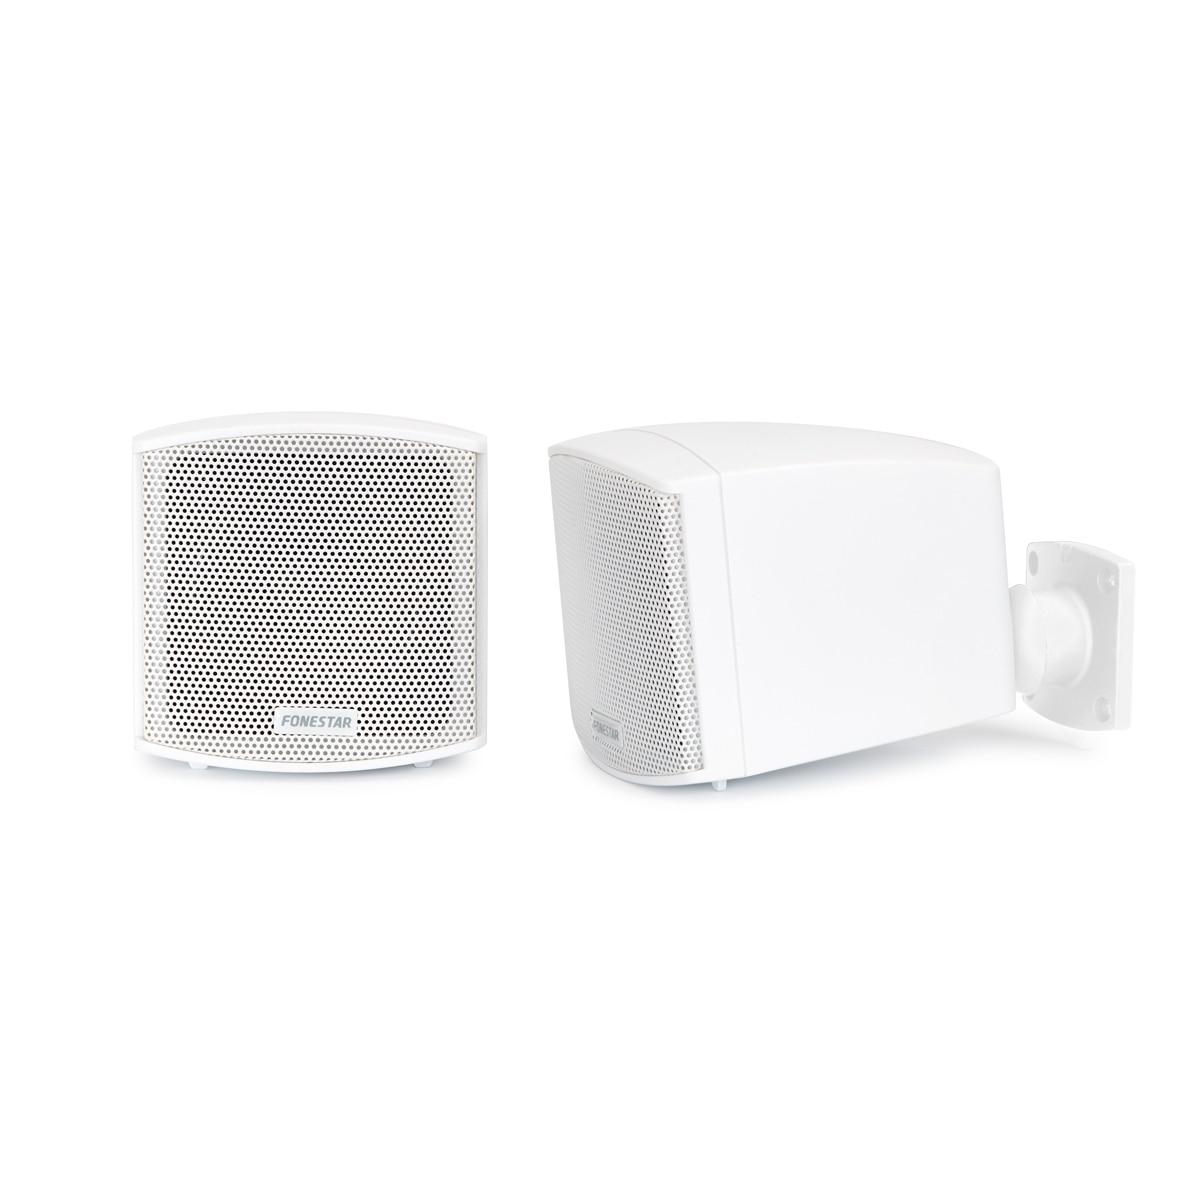 Couple's Baffles Fonestar CUBE-62B Low Impedance, Ideal Public Address System, Power 25 W Max, Tenderness 88 DB, Colo